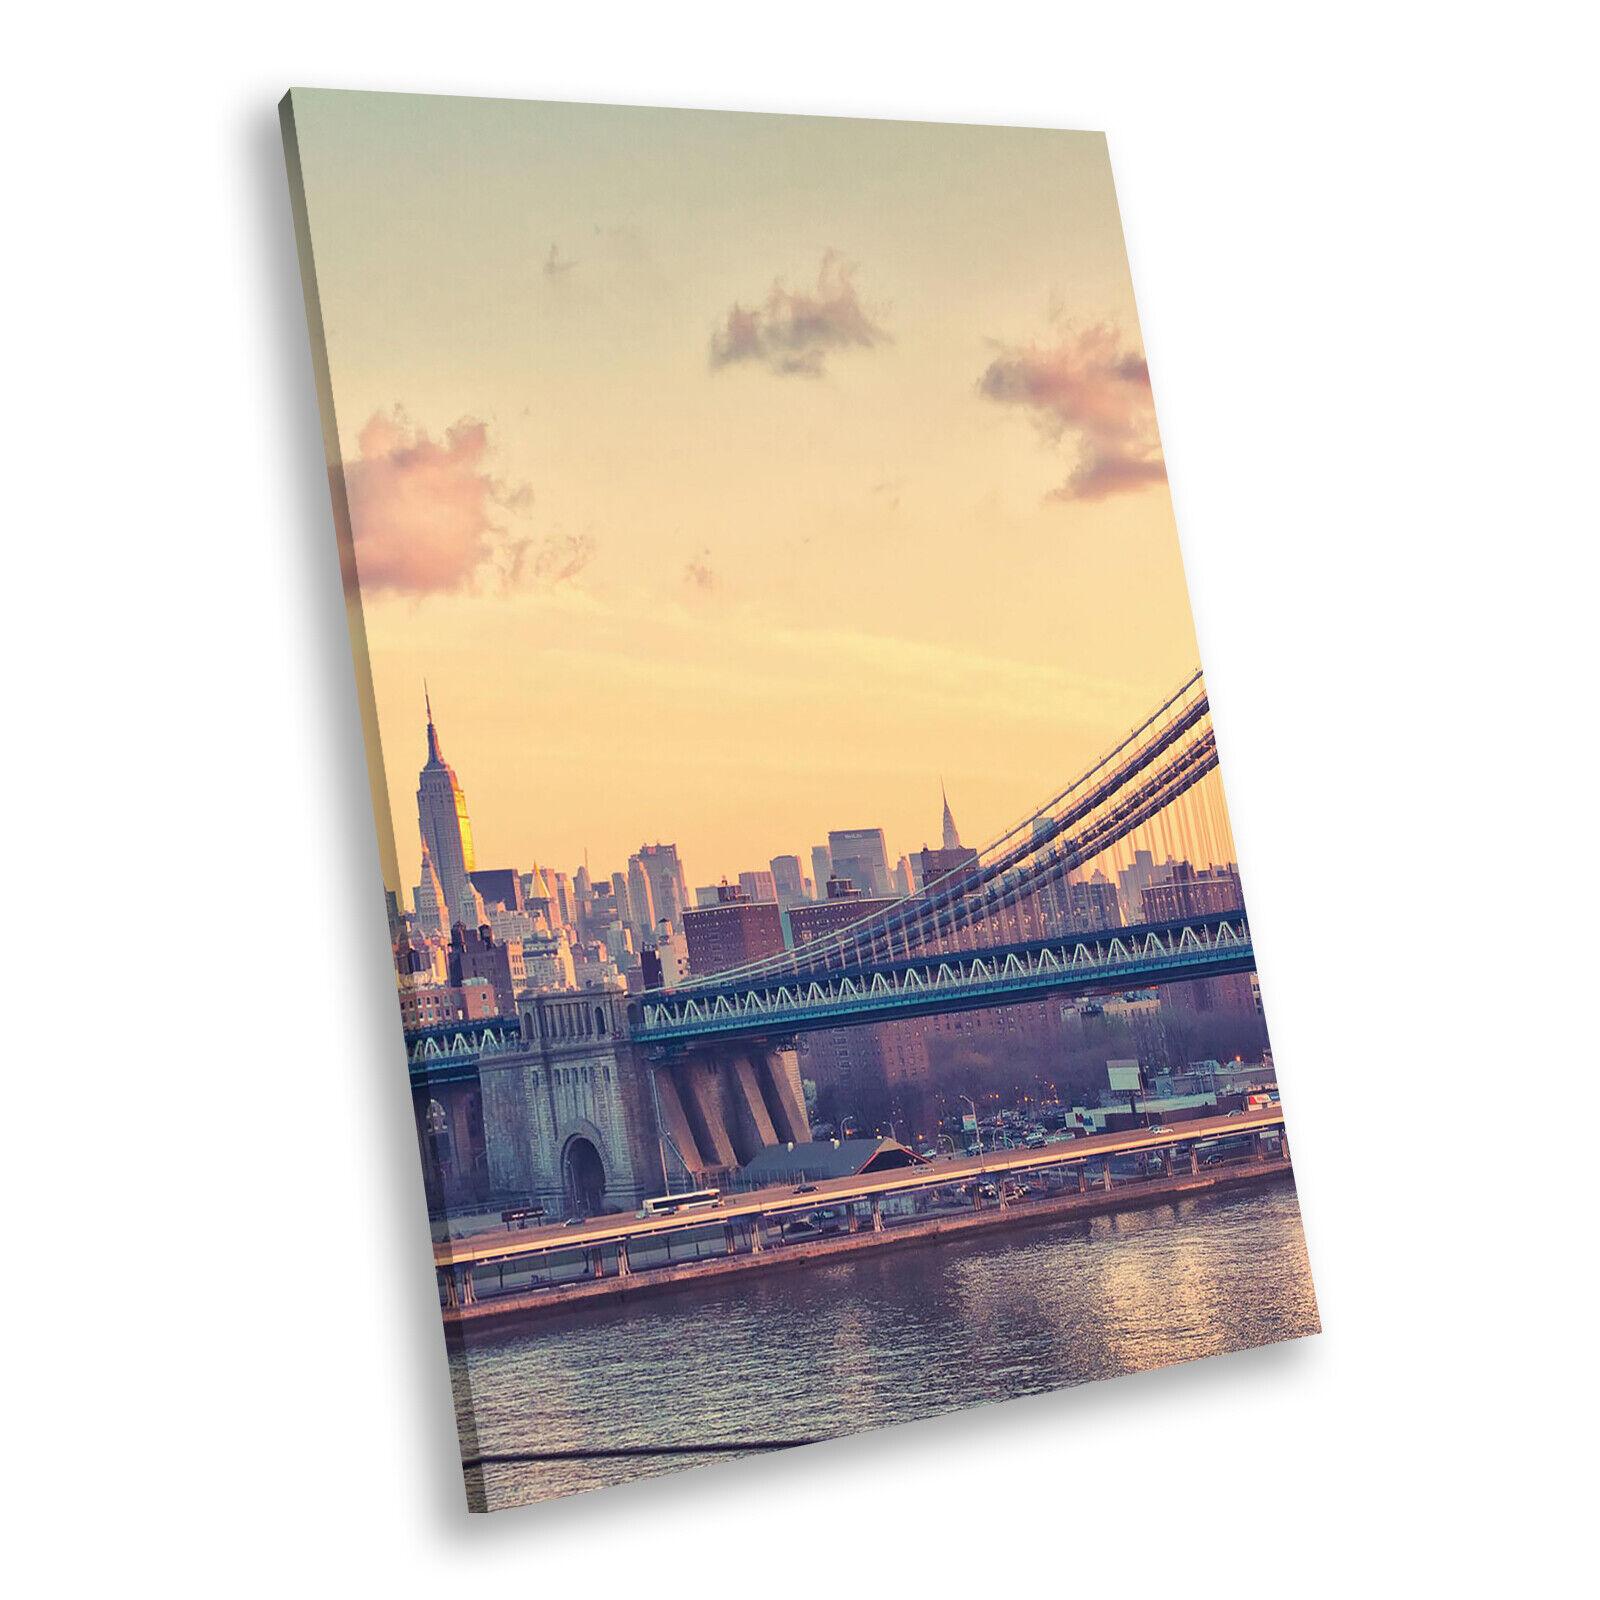 New York Bridge Retro Cool Portrait Scenic Canvas Wall Art Large Picture Prints